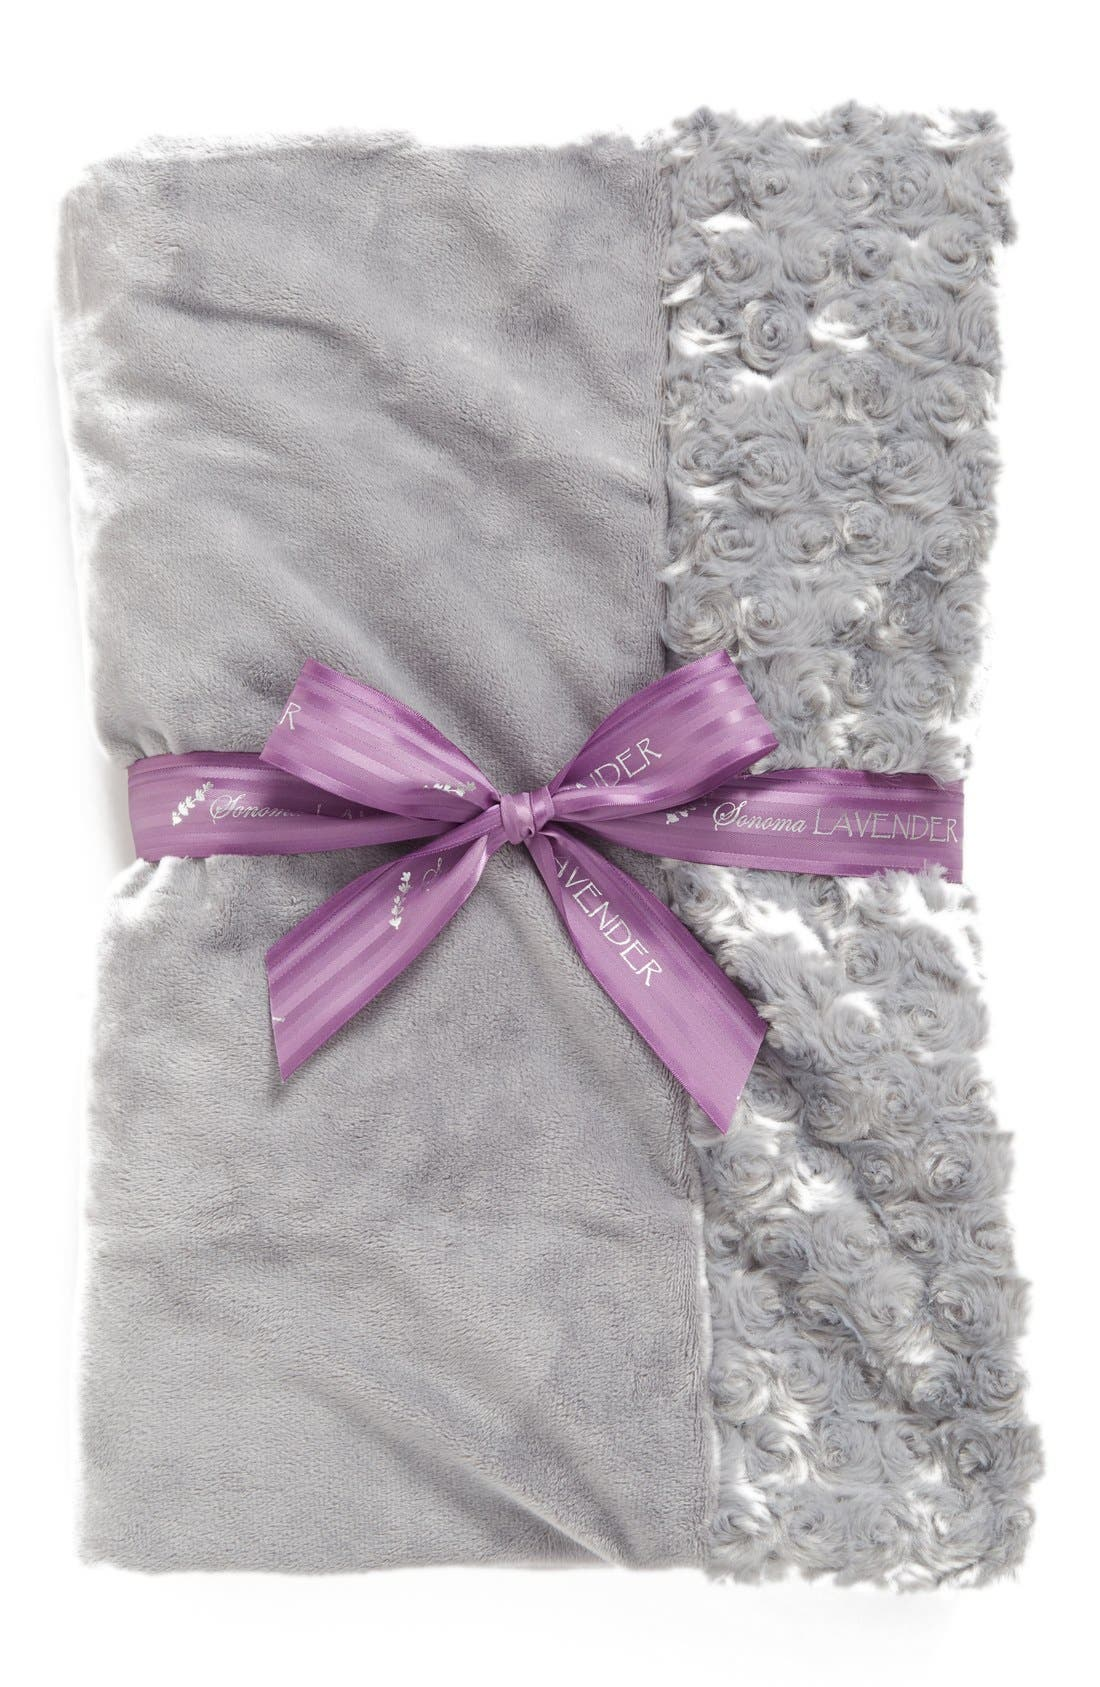 Sonoma Lavender Silver Rosette Blankie (Nordstrom Exclusive) ($70 Value)